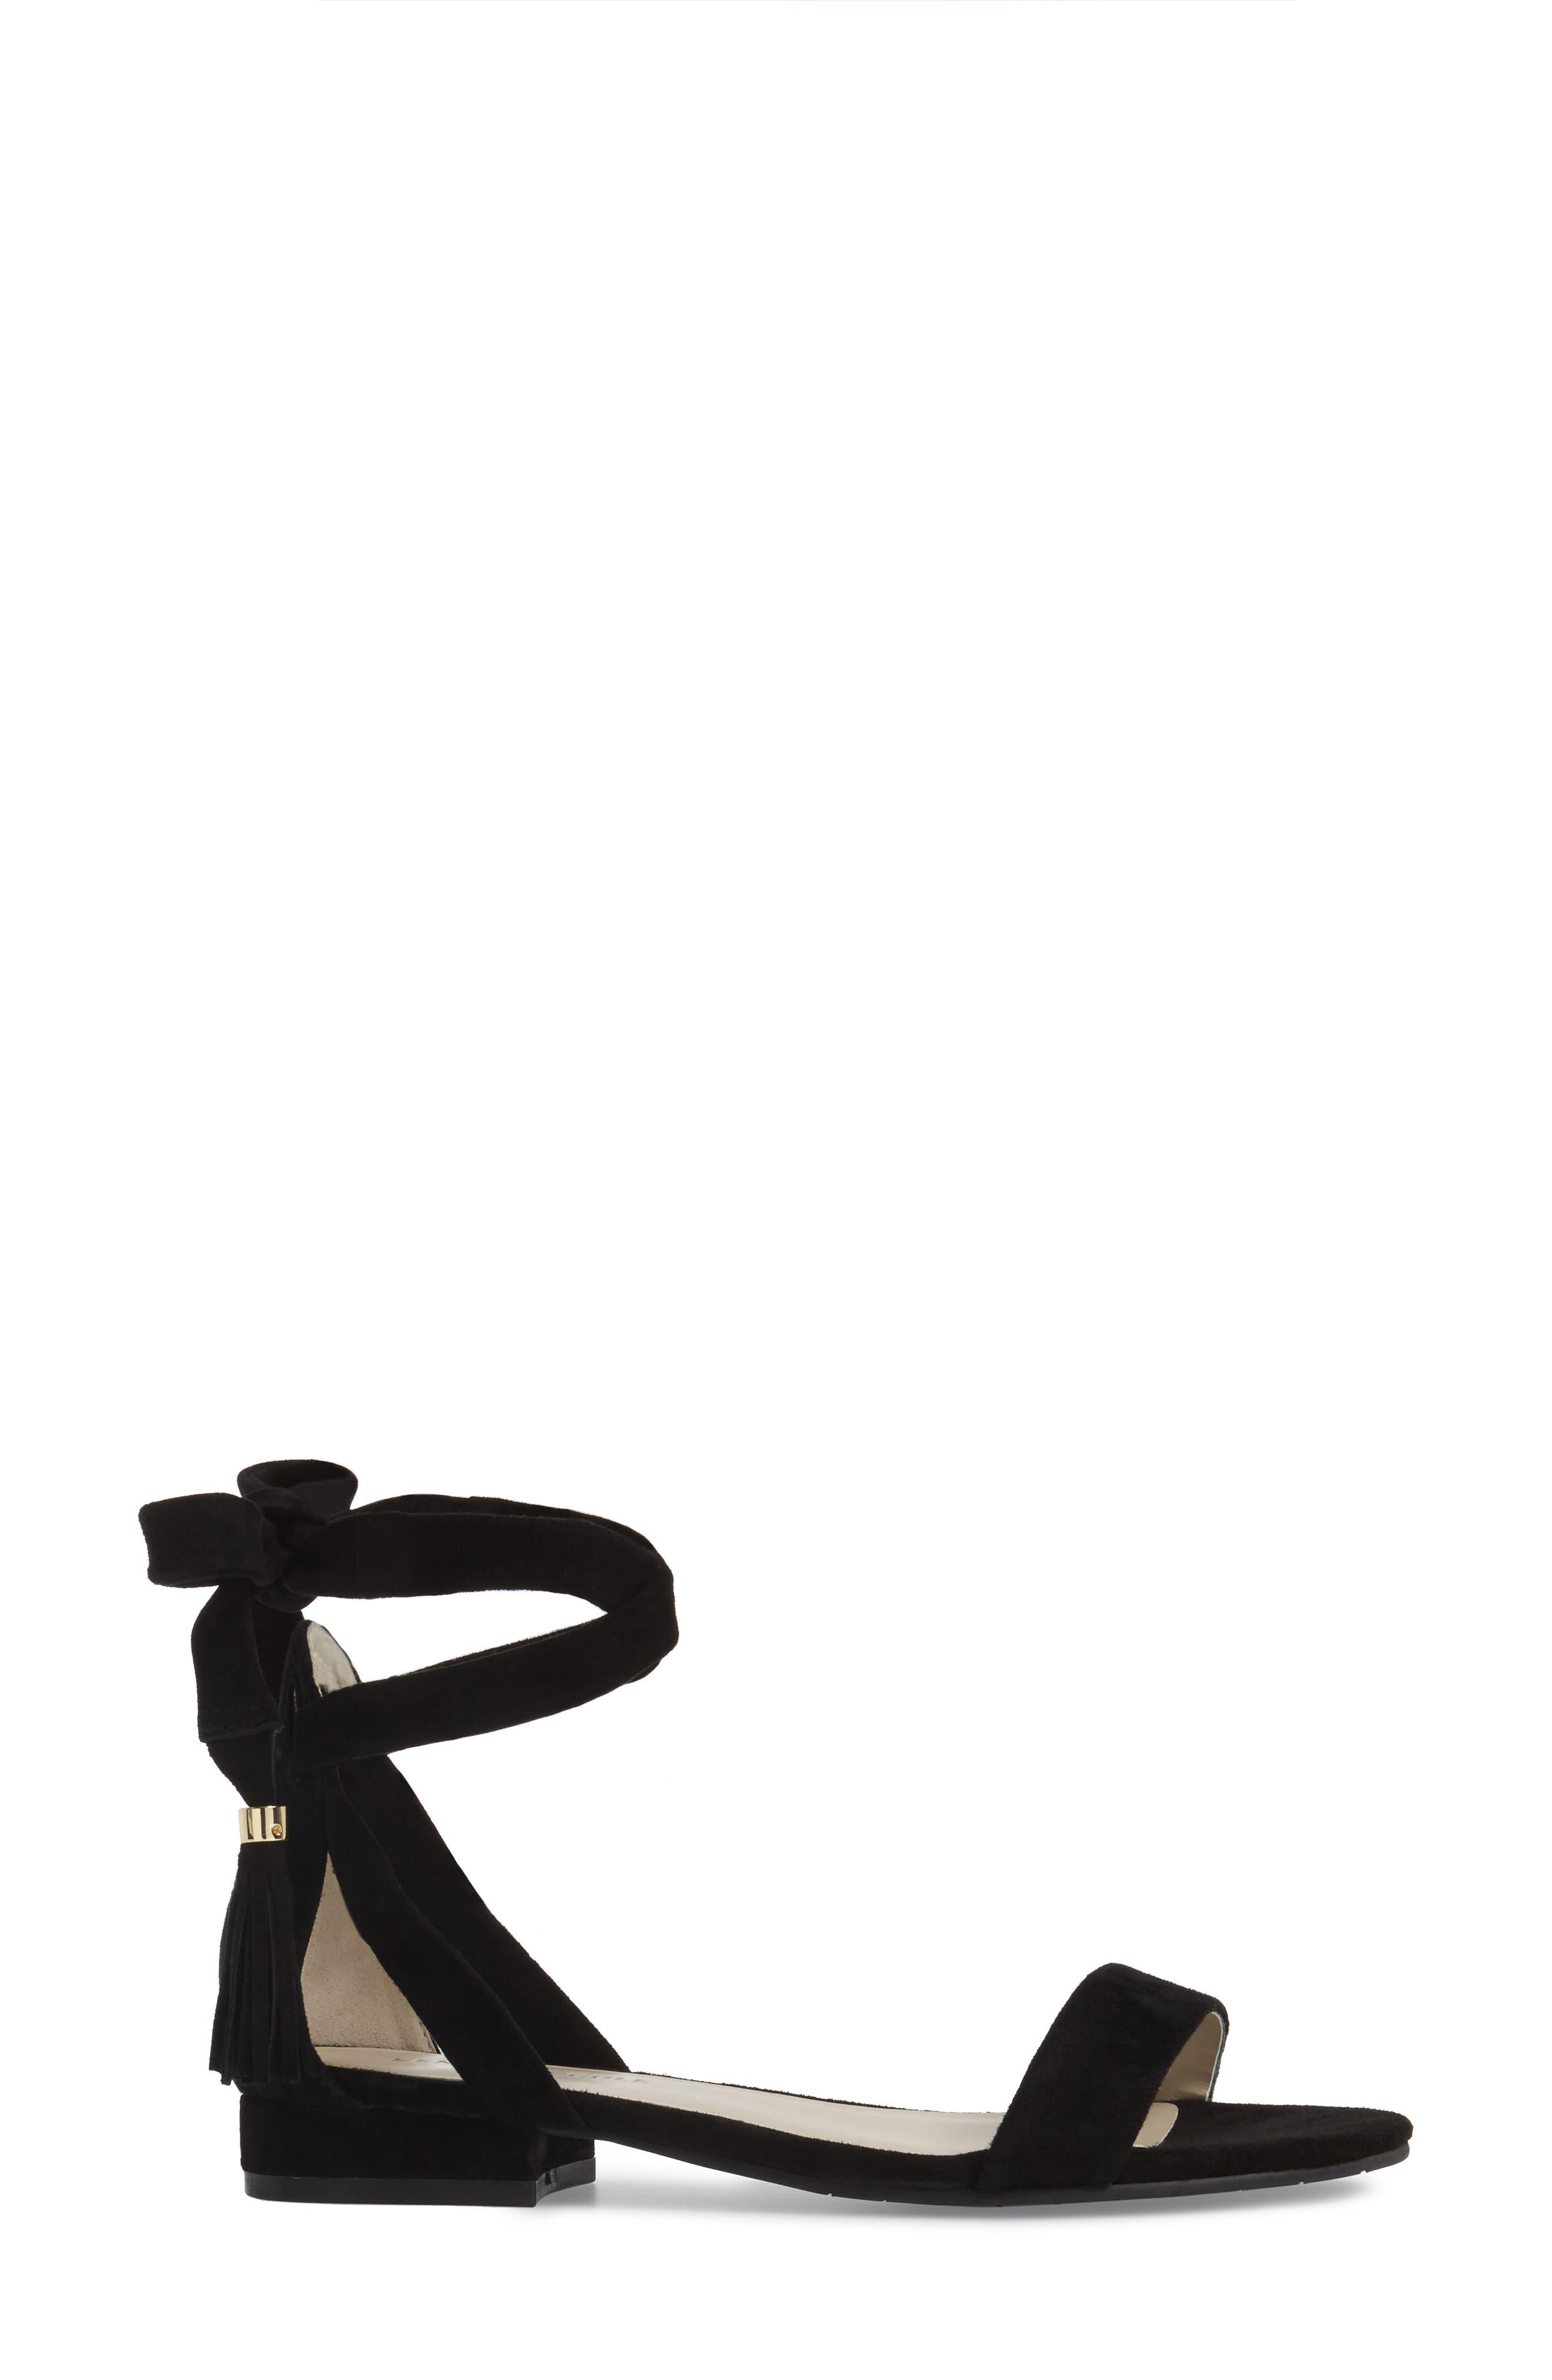 Valen Tassel Lace-Up Sandal,                             Alternate thumbnail 31, color,